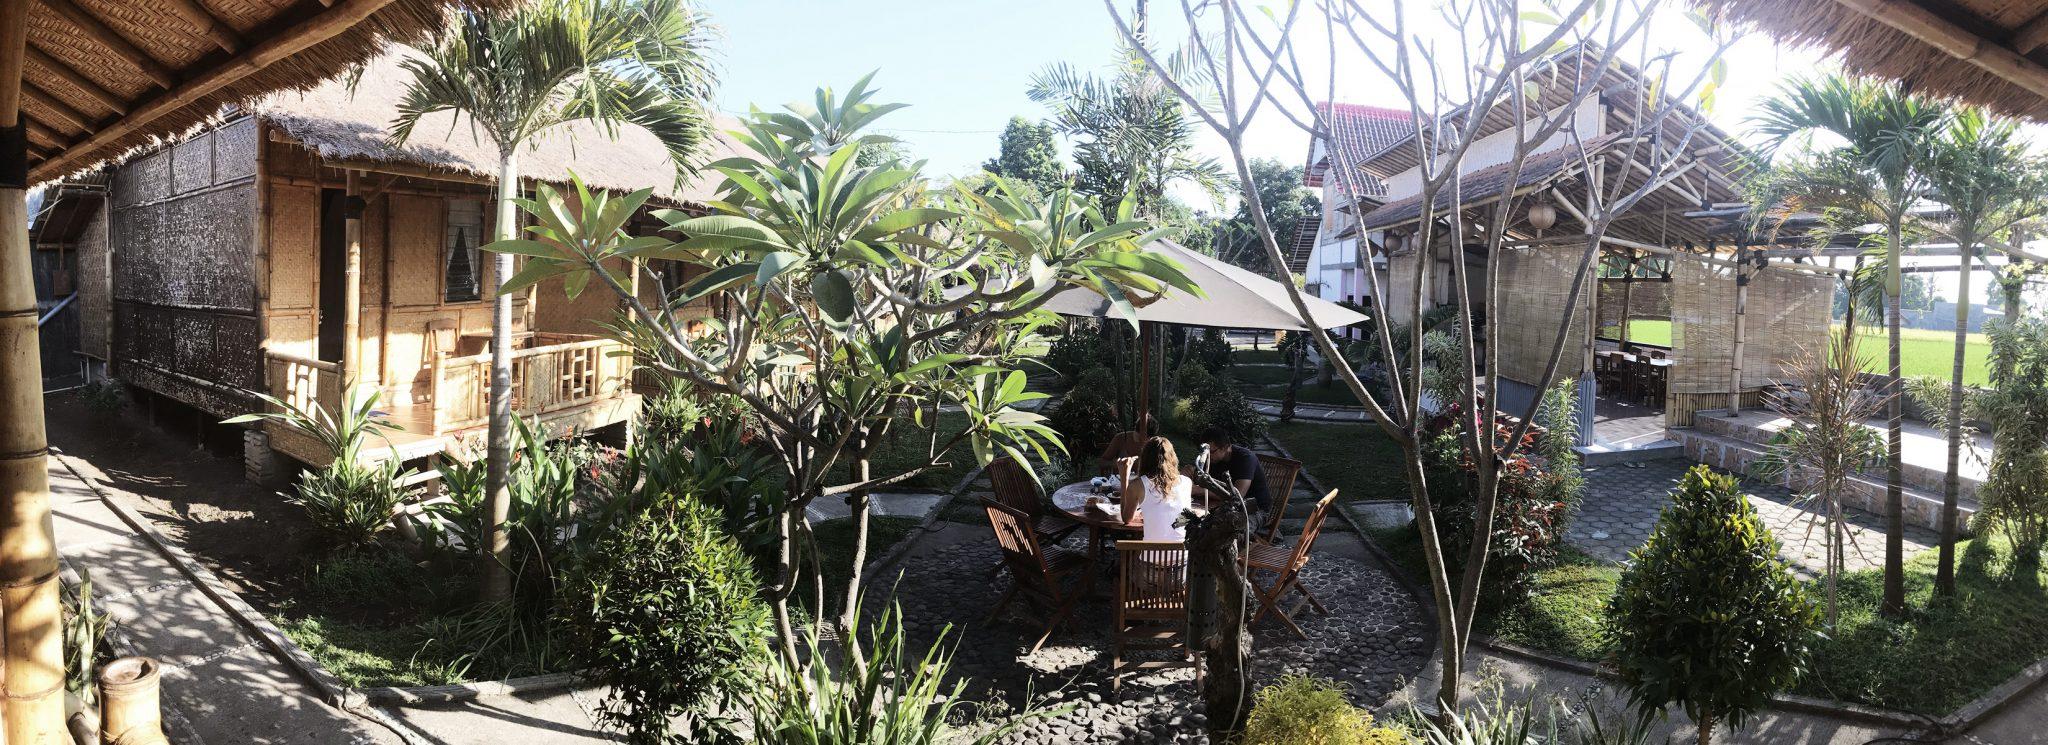 16 JAWA - Jawa: wulkan Ijen, Bromo, Yogyakarta i świątynie